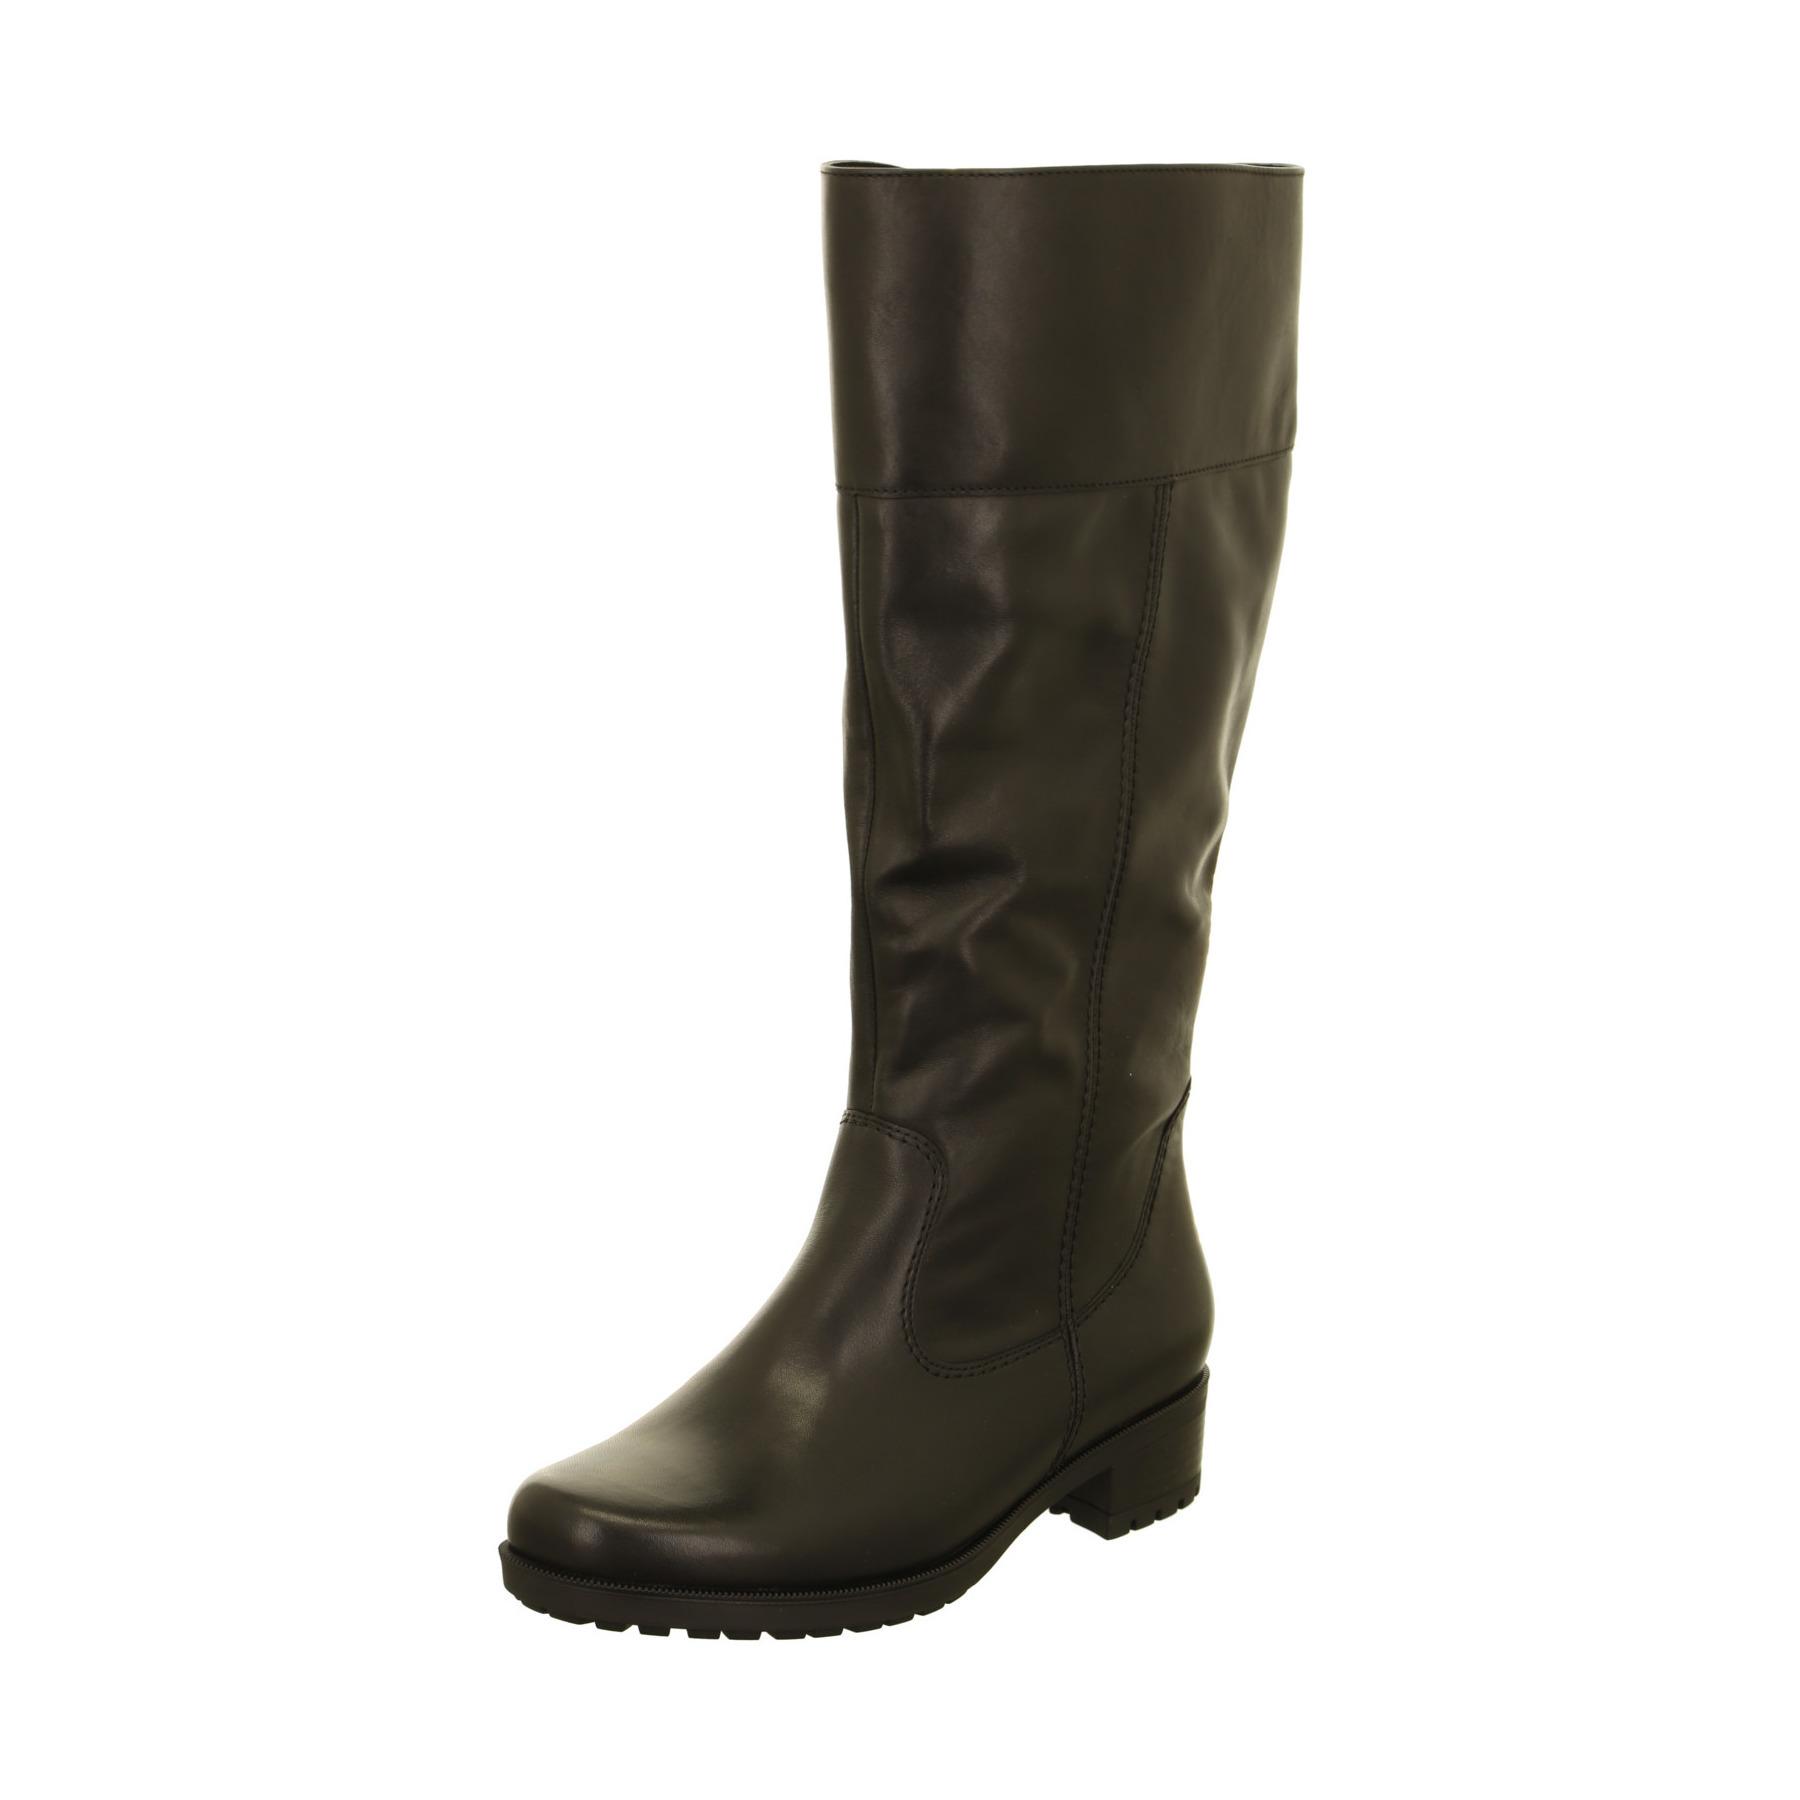 b114ce22e2 Soňa - Dámska obuv - Čižmy - Dámska čižma vysoká zateplená na nízkom ...